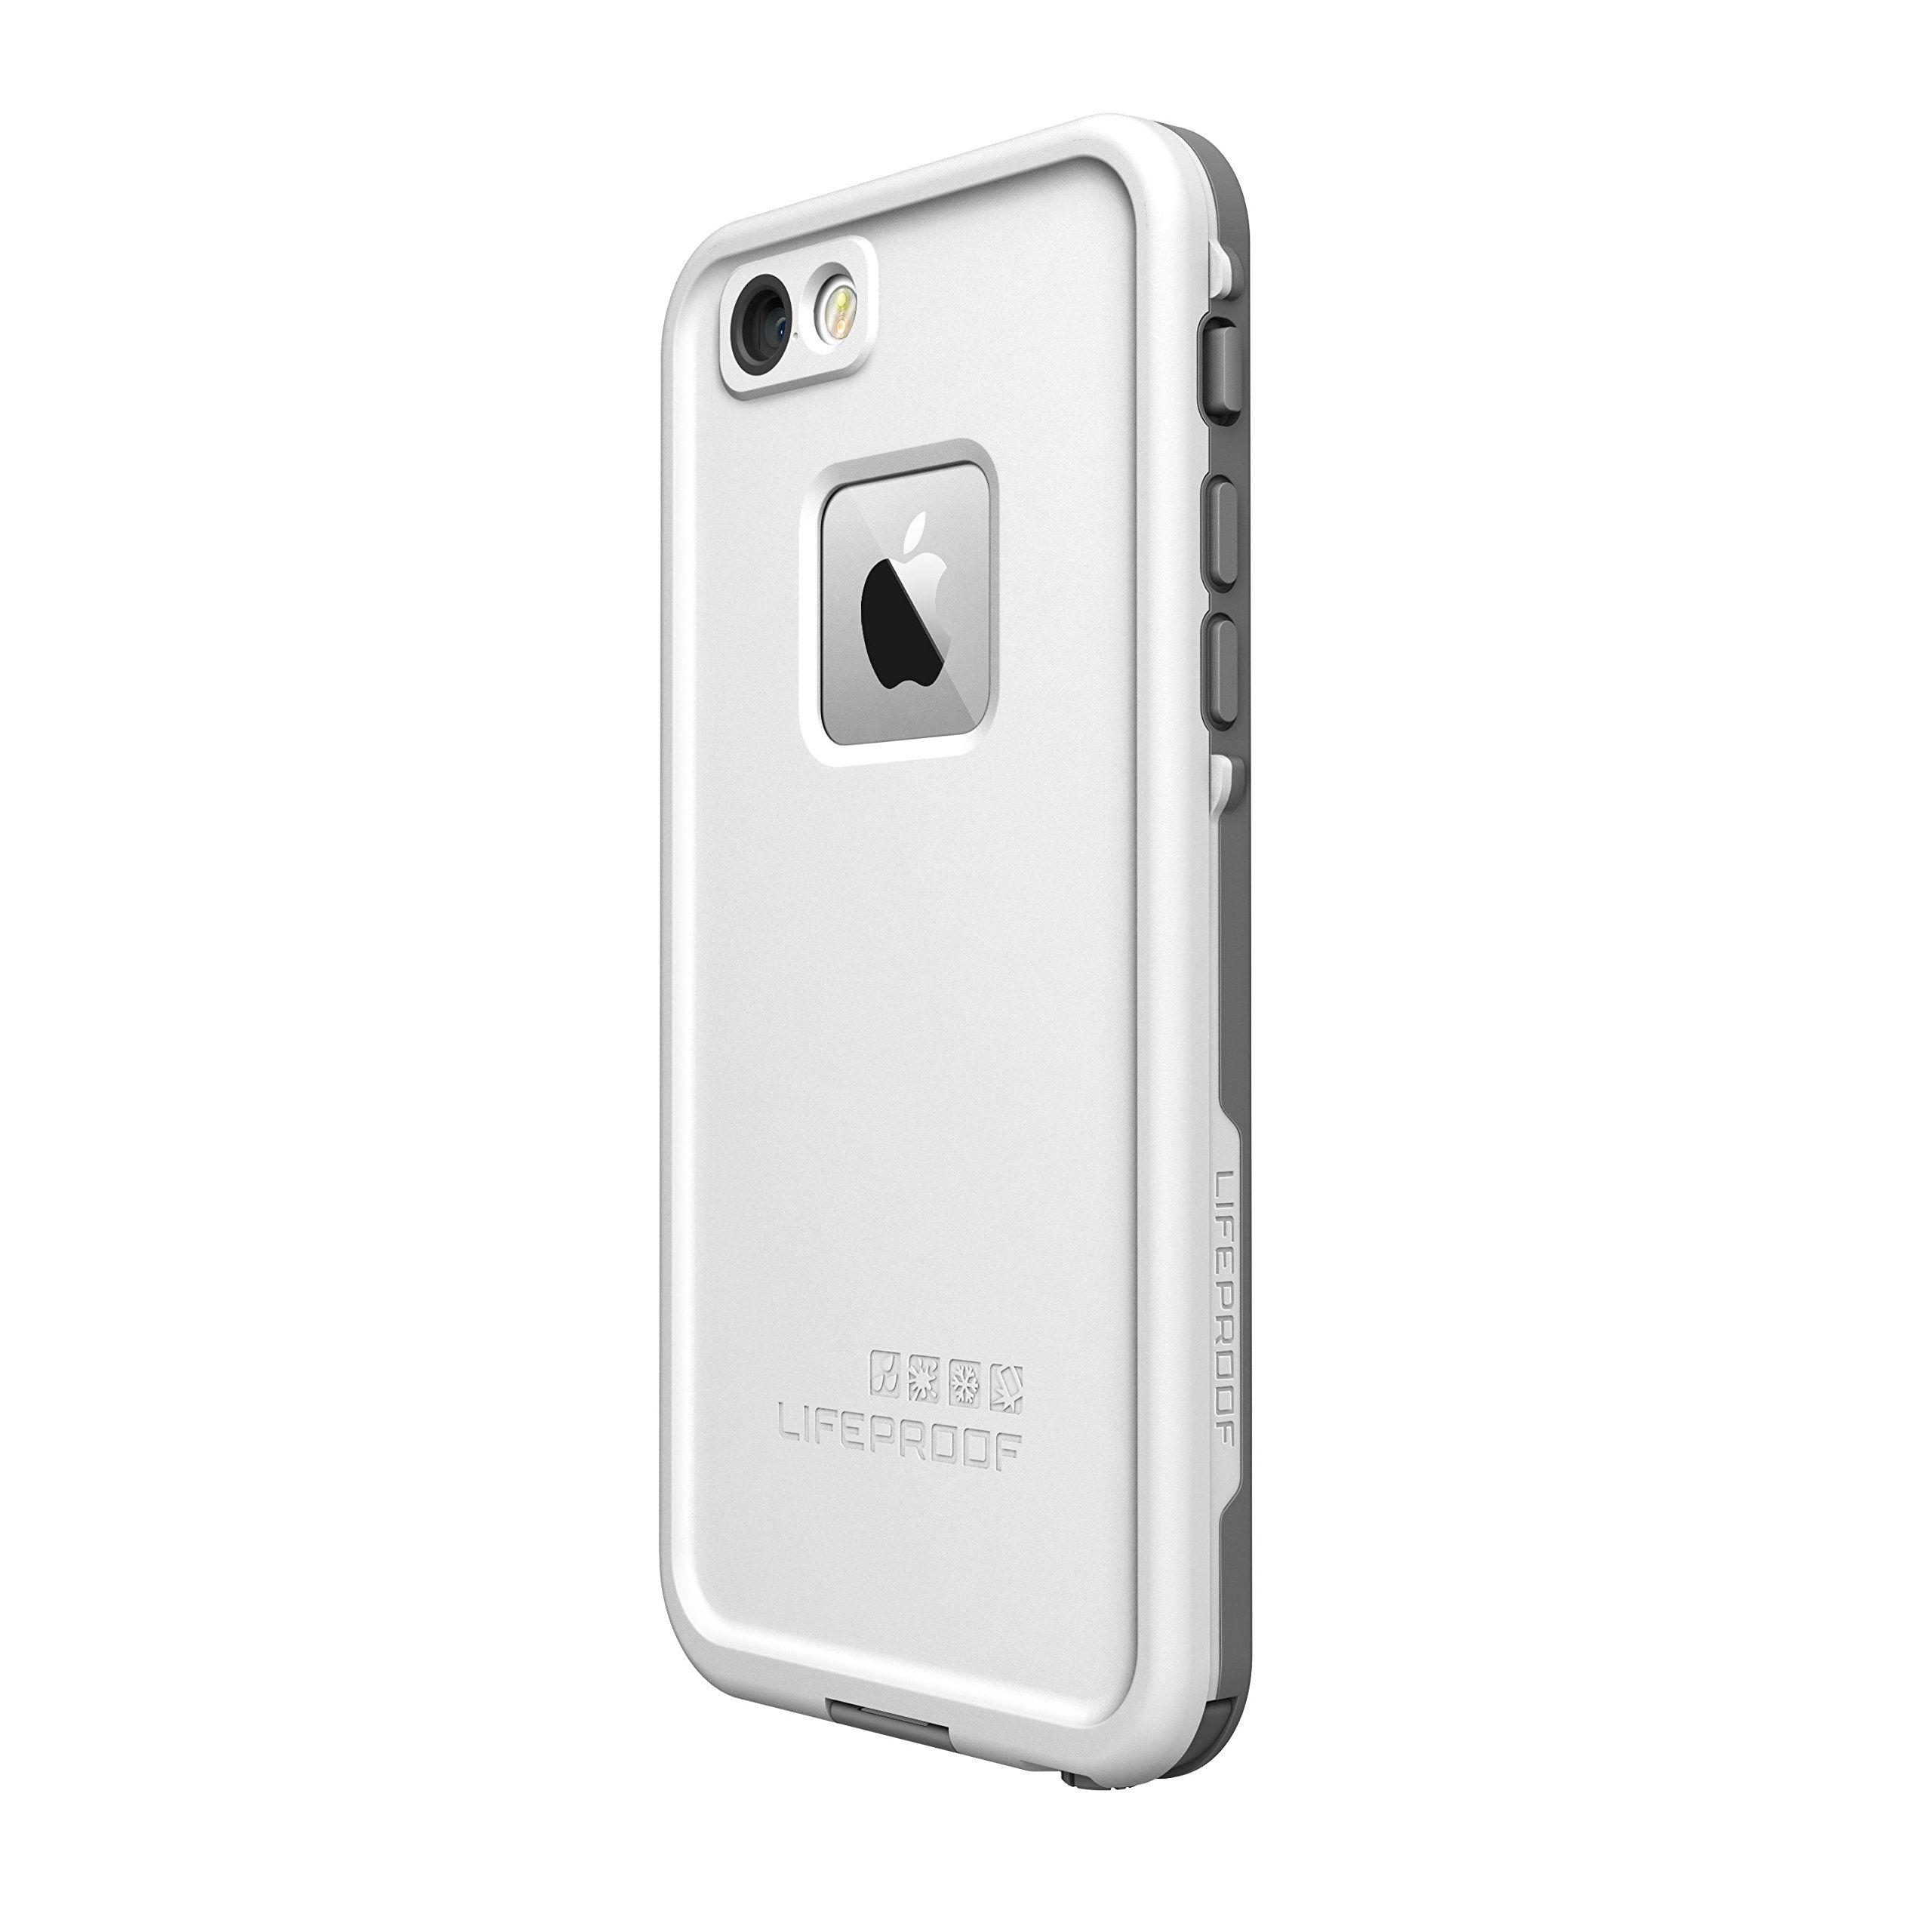 promo code c9b9b c01a3 Amazon.com: LifeProof FRE iPhone 6 ONLY Waterproof Case (4.7 ...